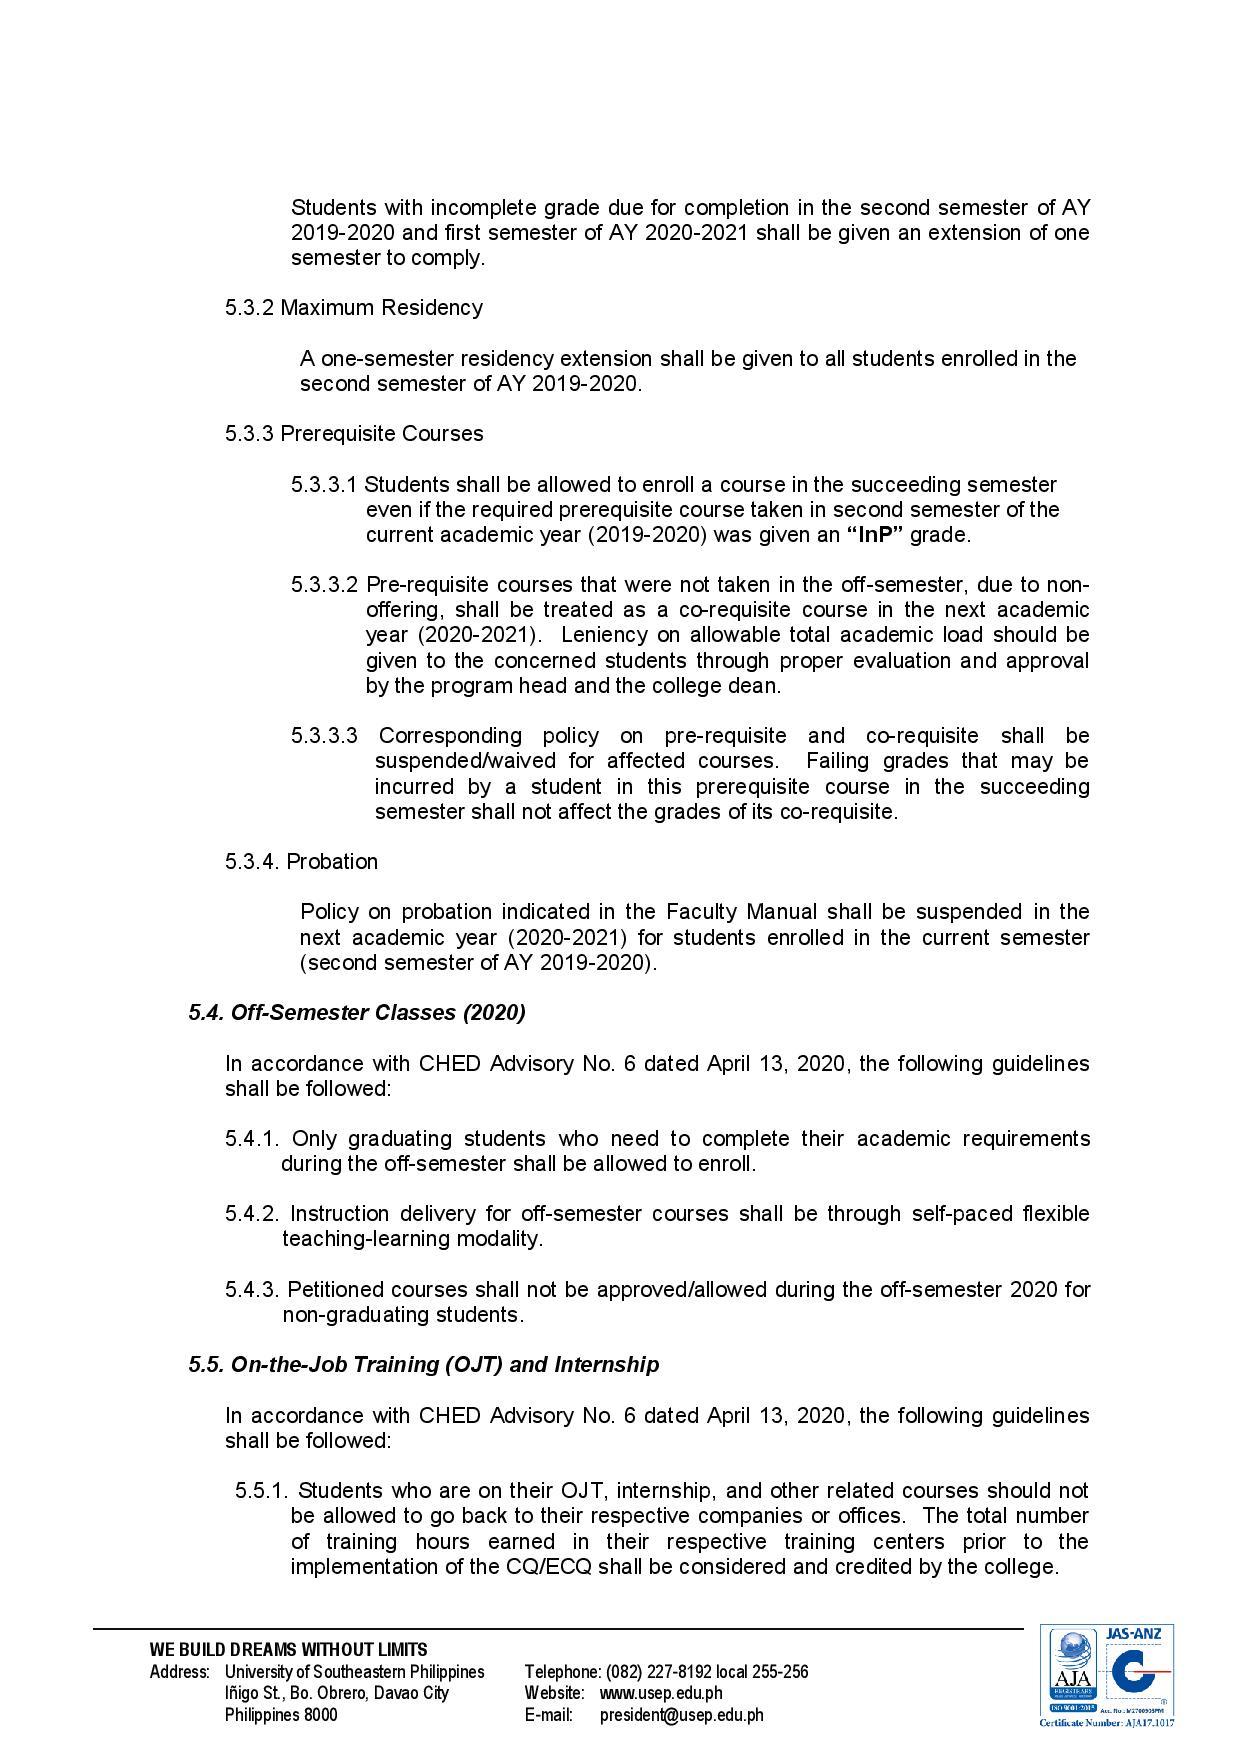 mc-02-s-2020-memorandum-circular-on-usep-academic-regulations-amidst-the-covid-19-pandemic-page-004